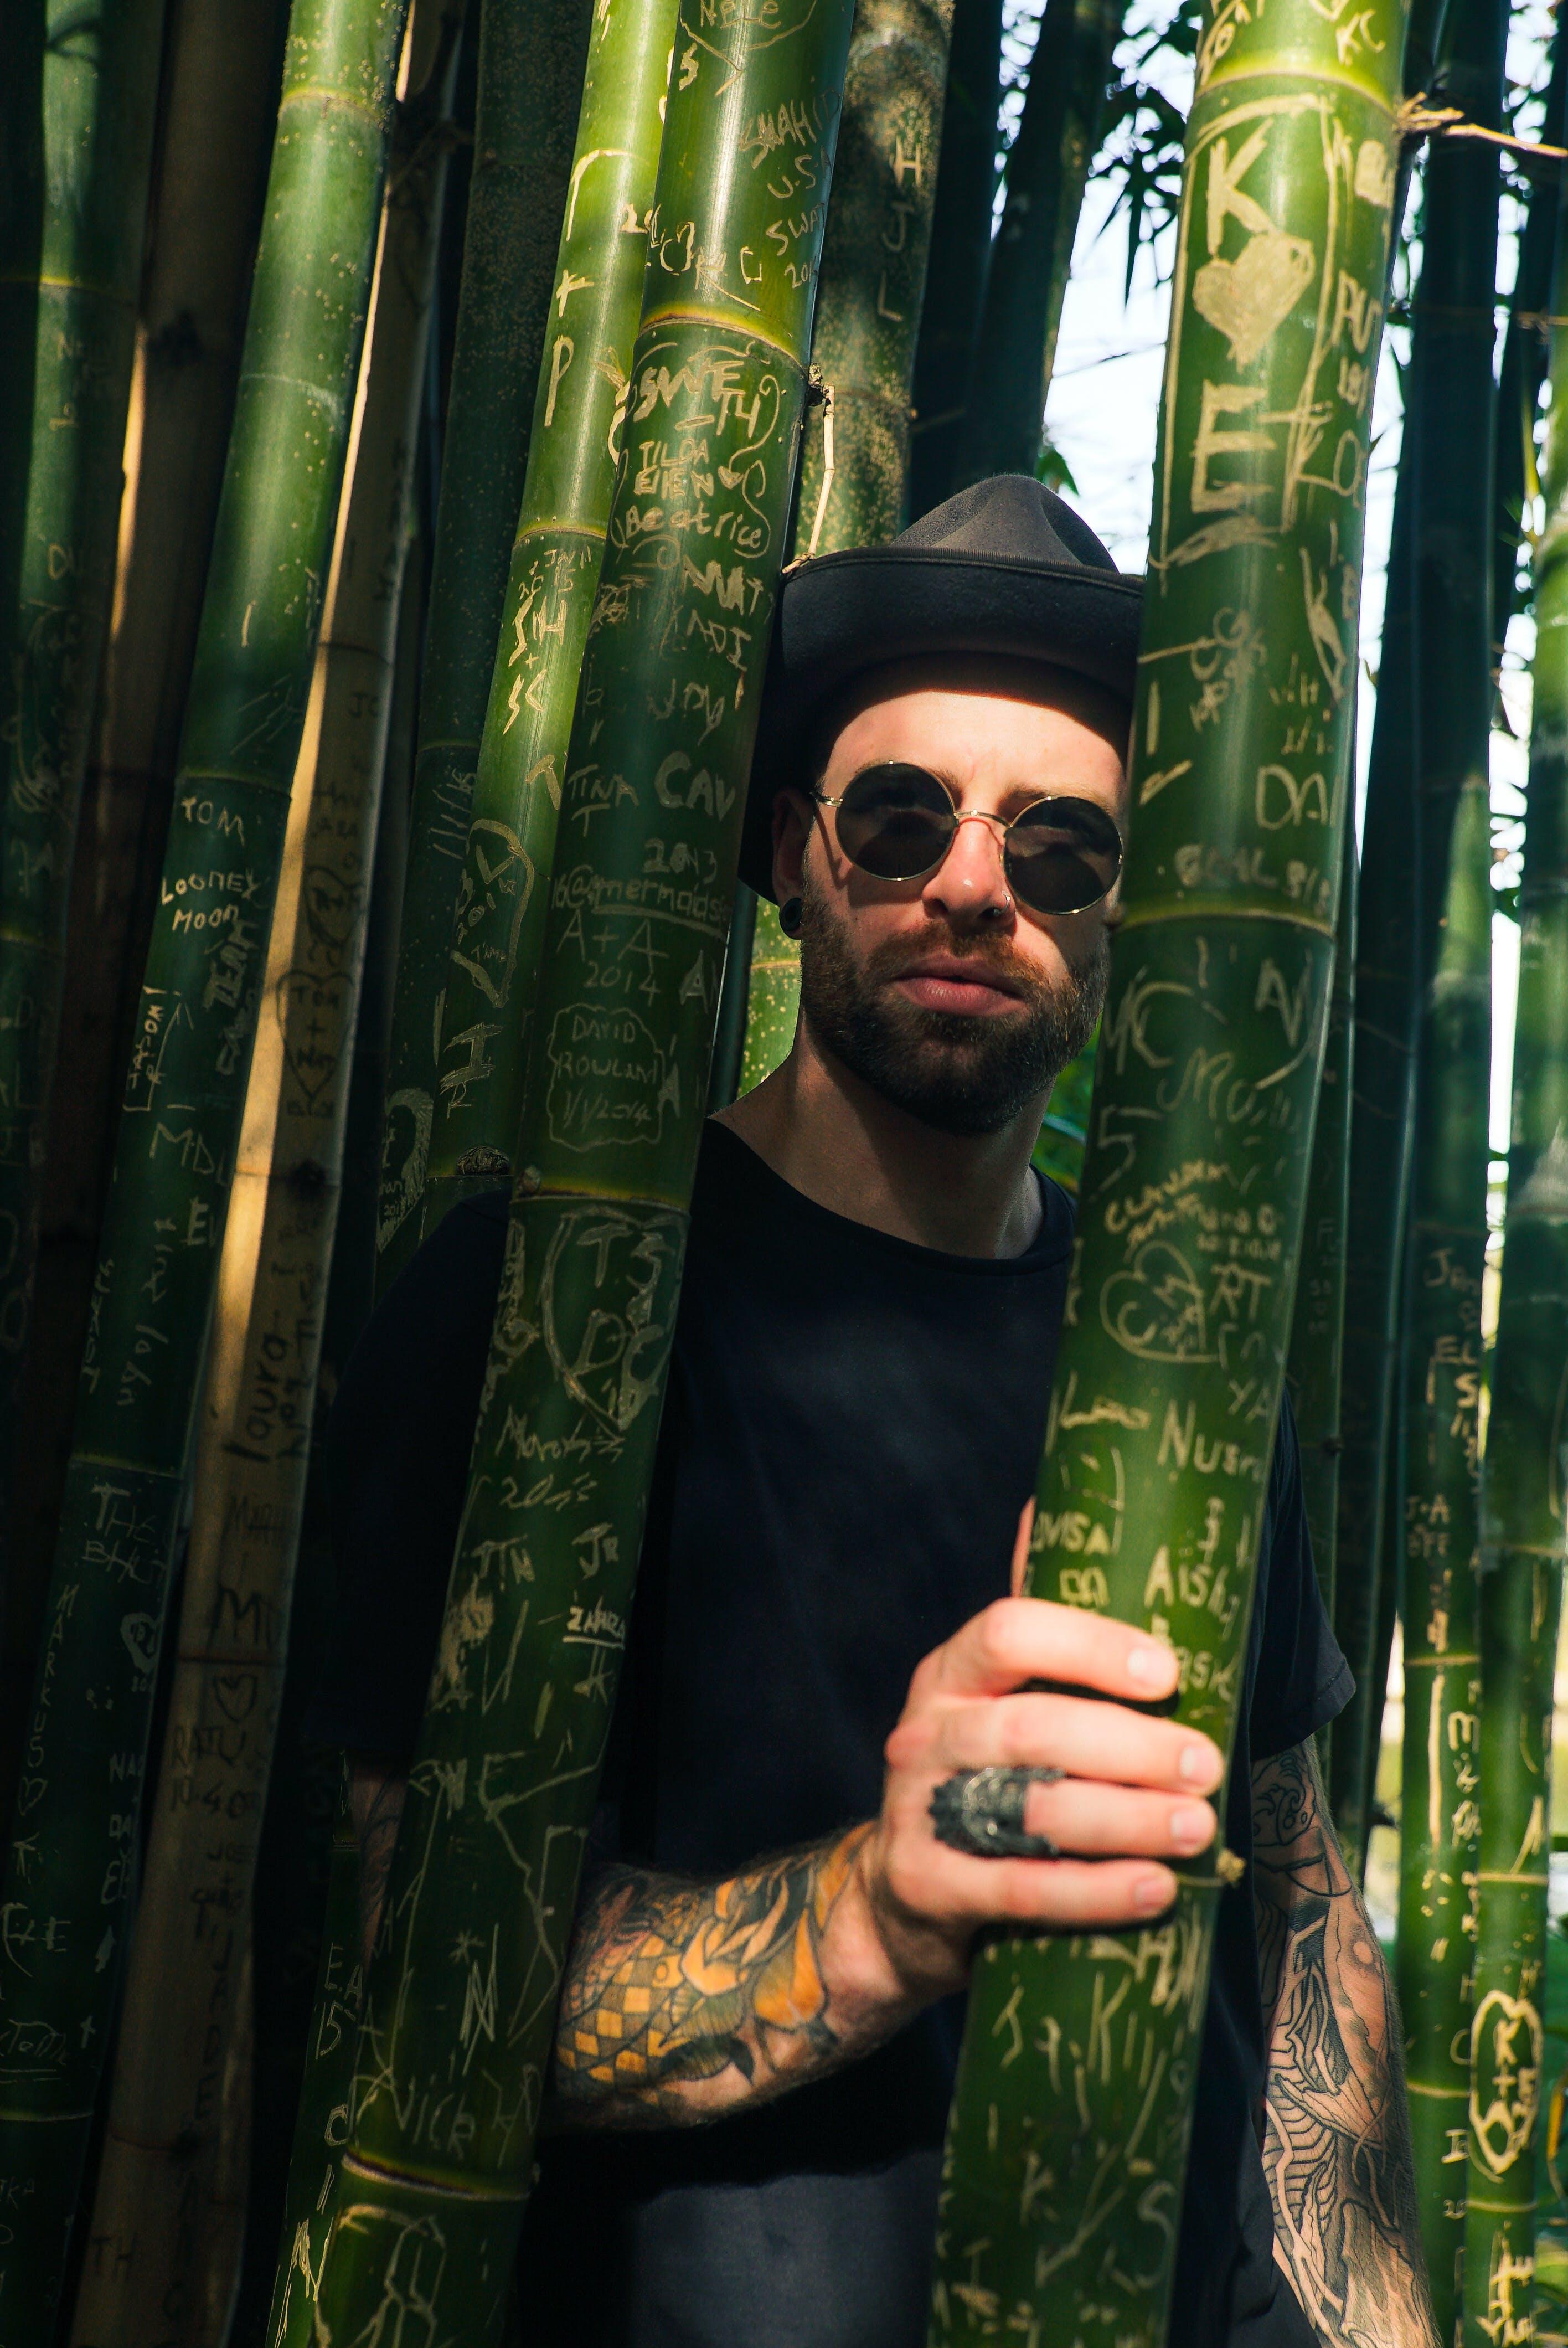 Man Through Bamboo Trees